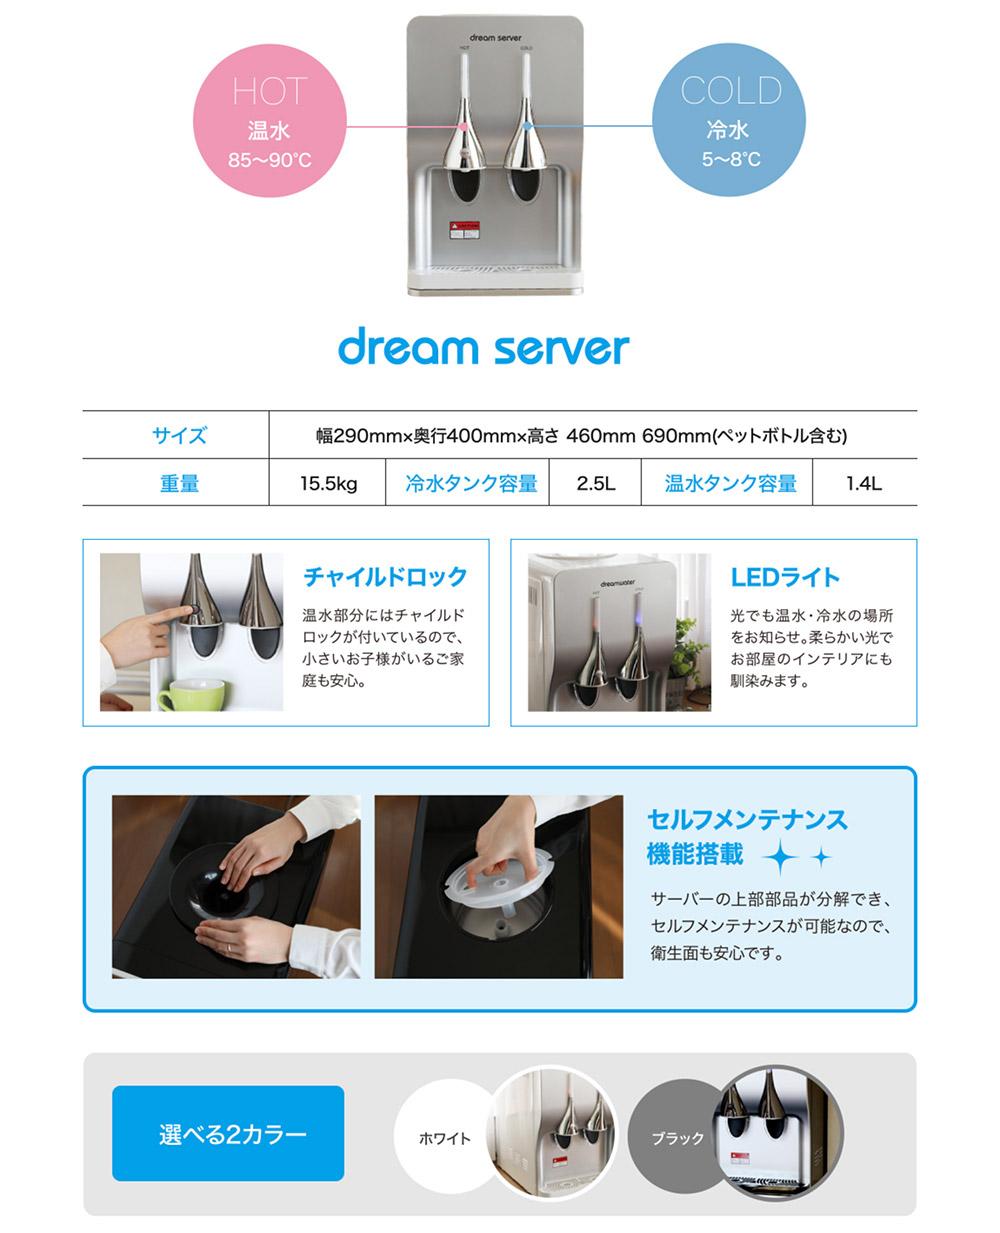 dream server 機能